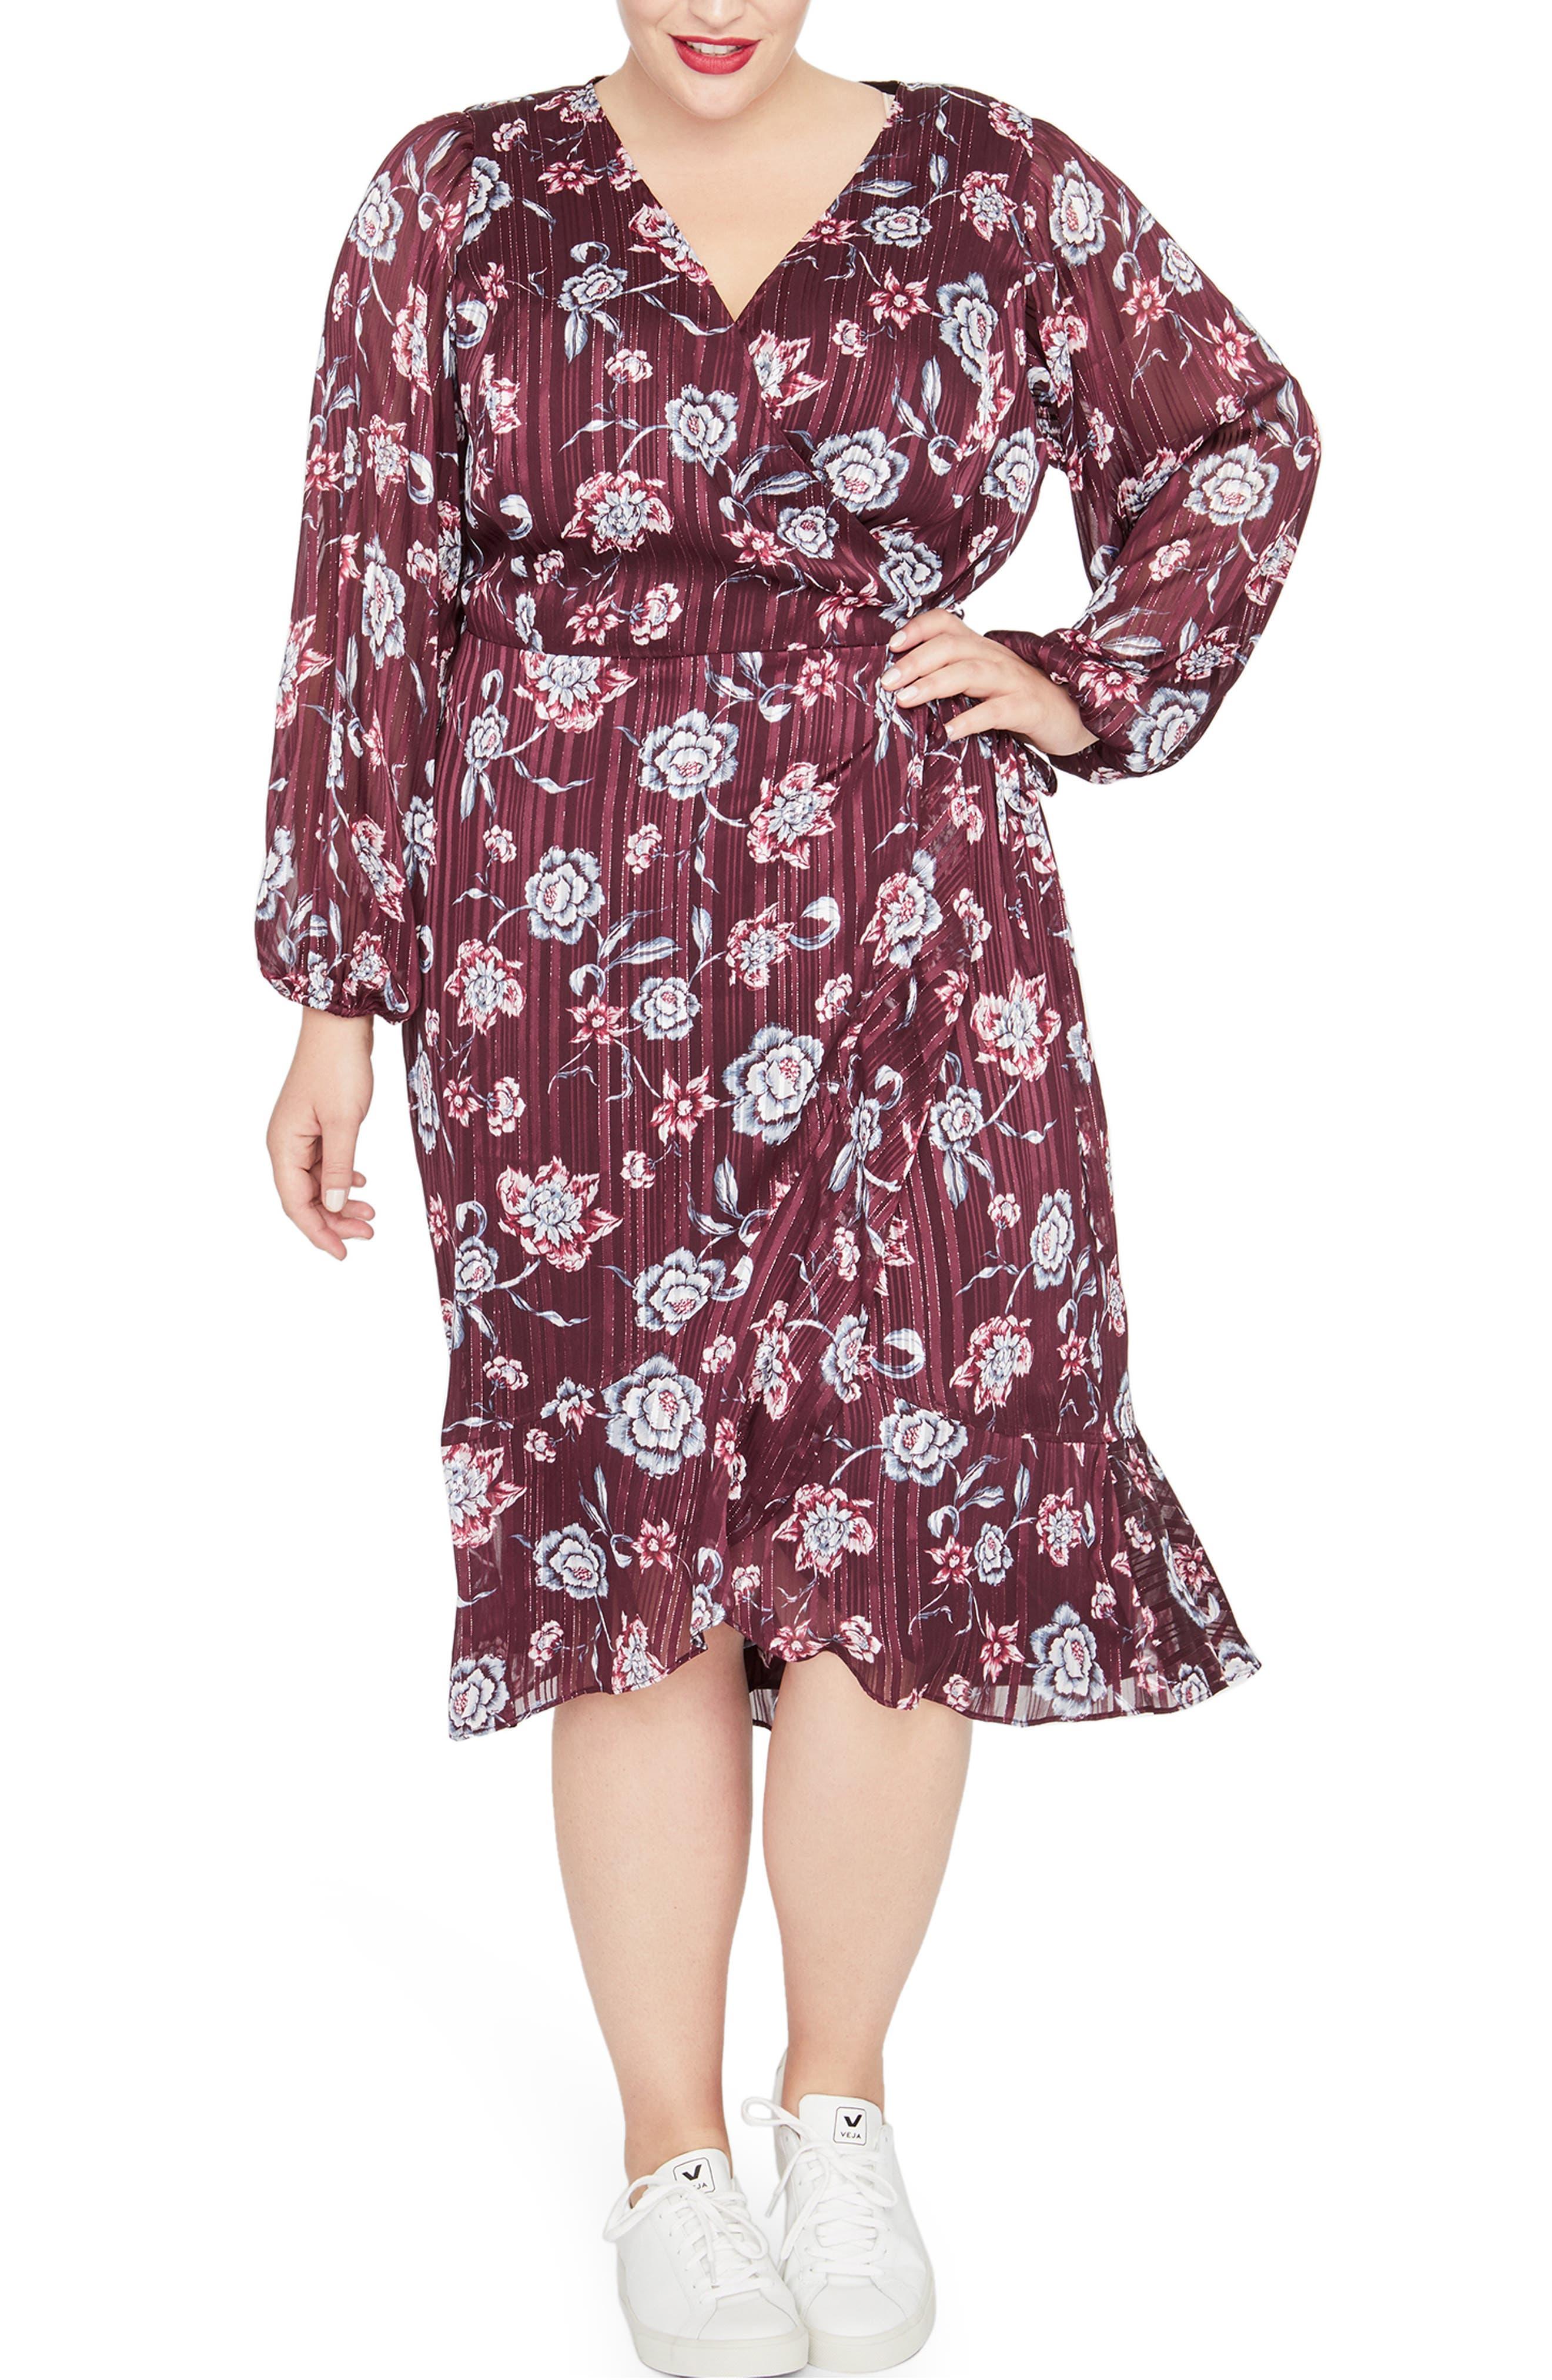 Gisela Floral Metalllic Detail Dress,                             Main thumbnail 1, color,                             ROYAL ORCHID COMBO